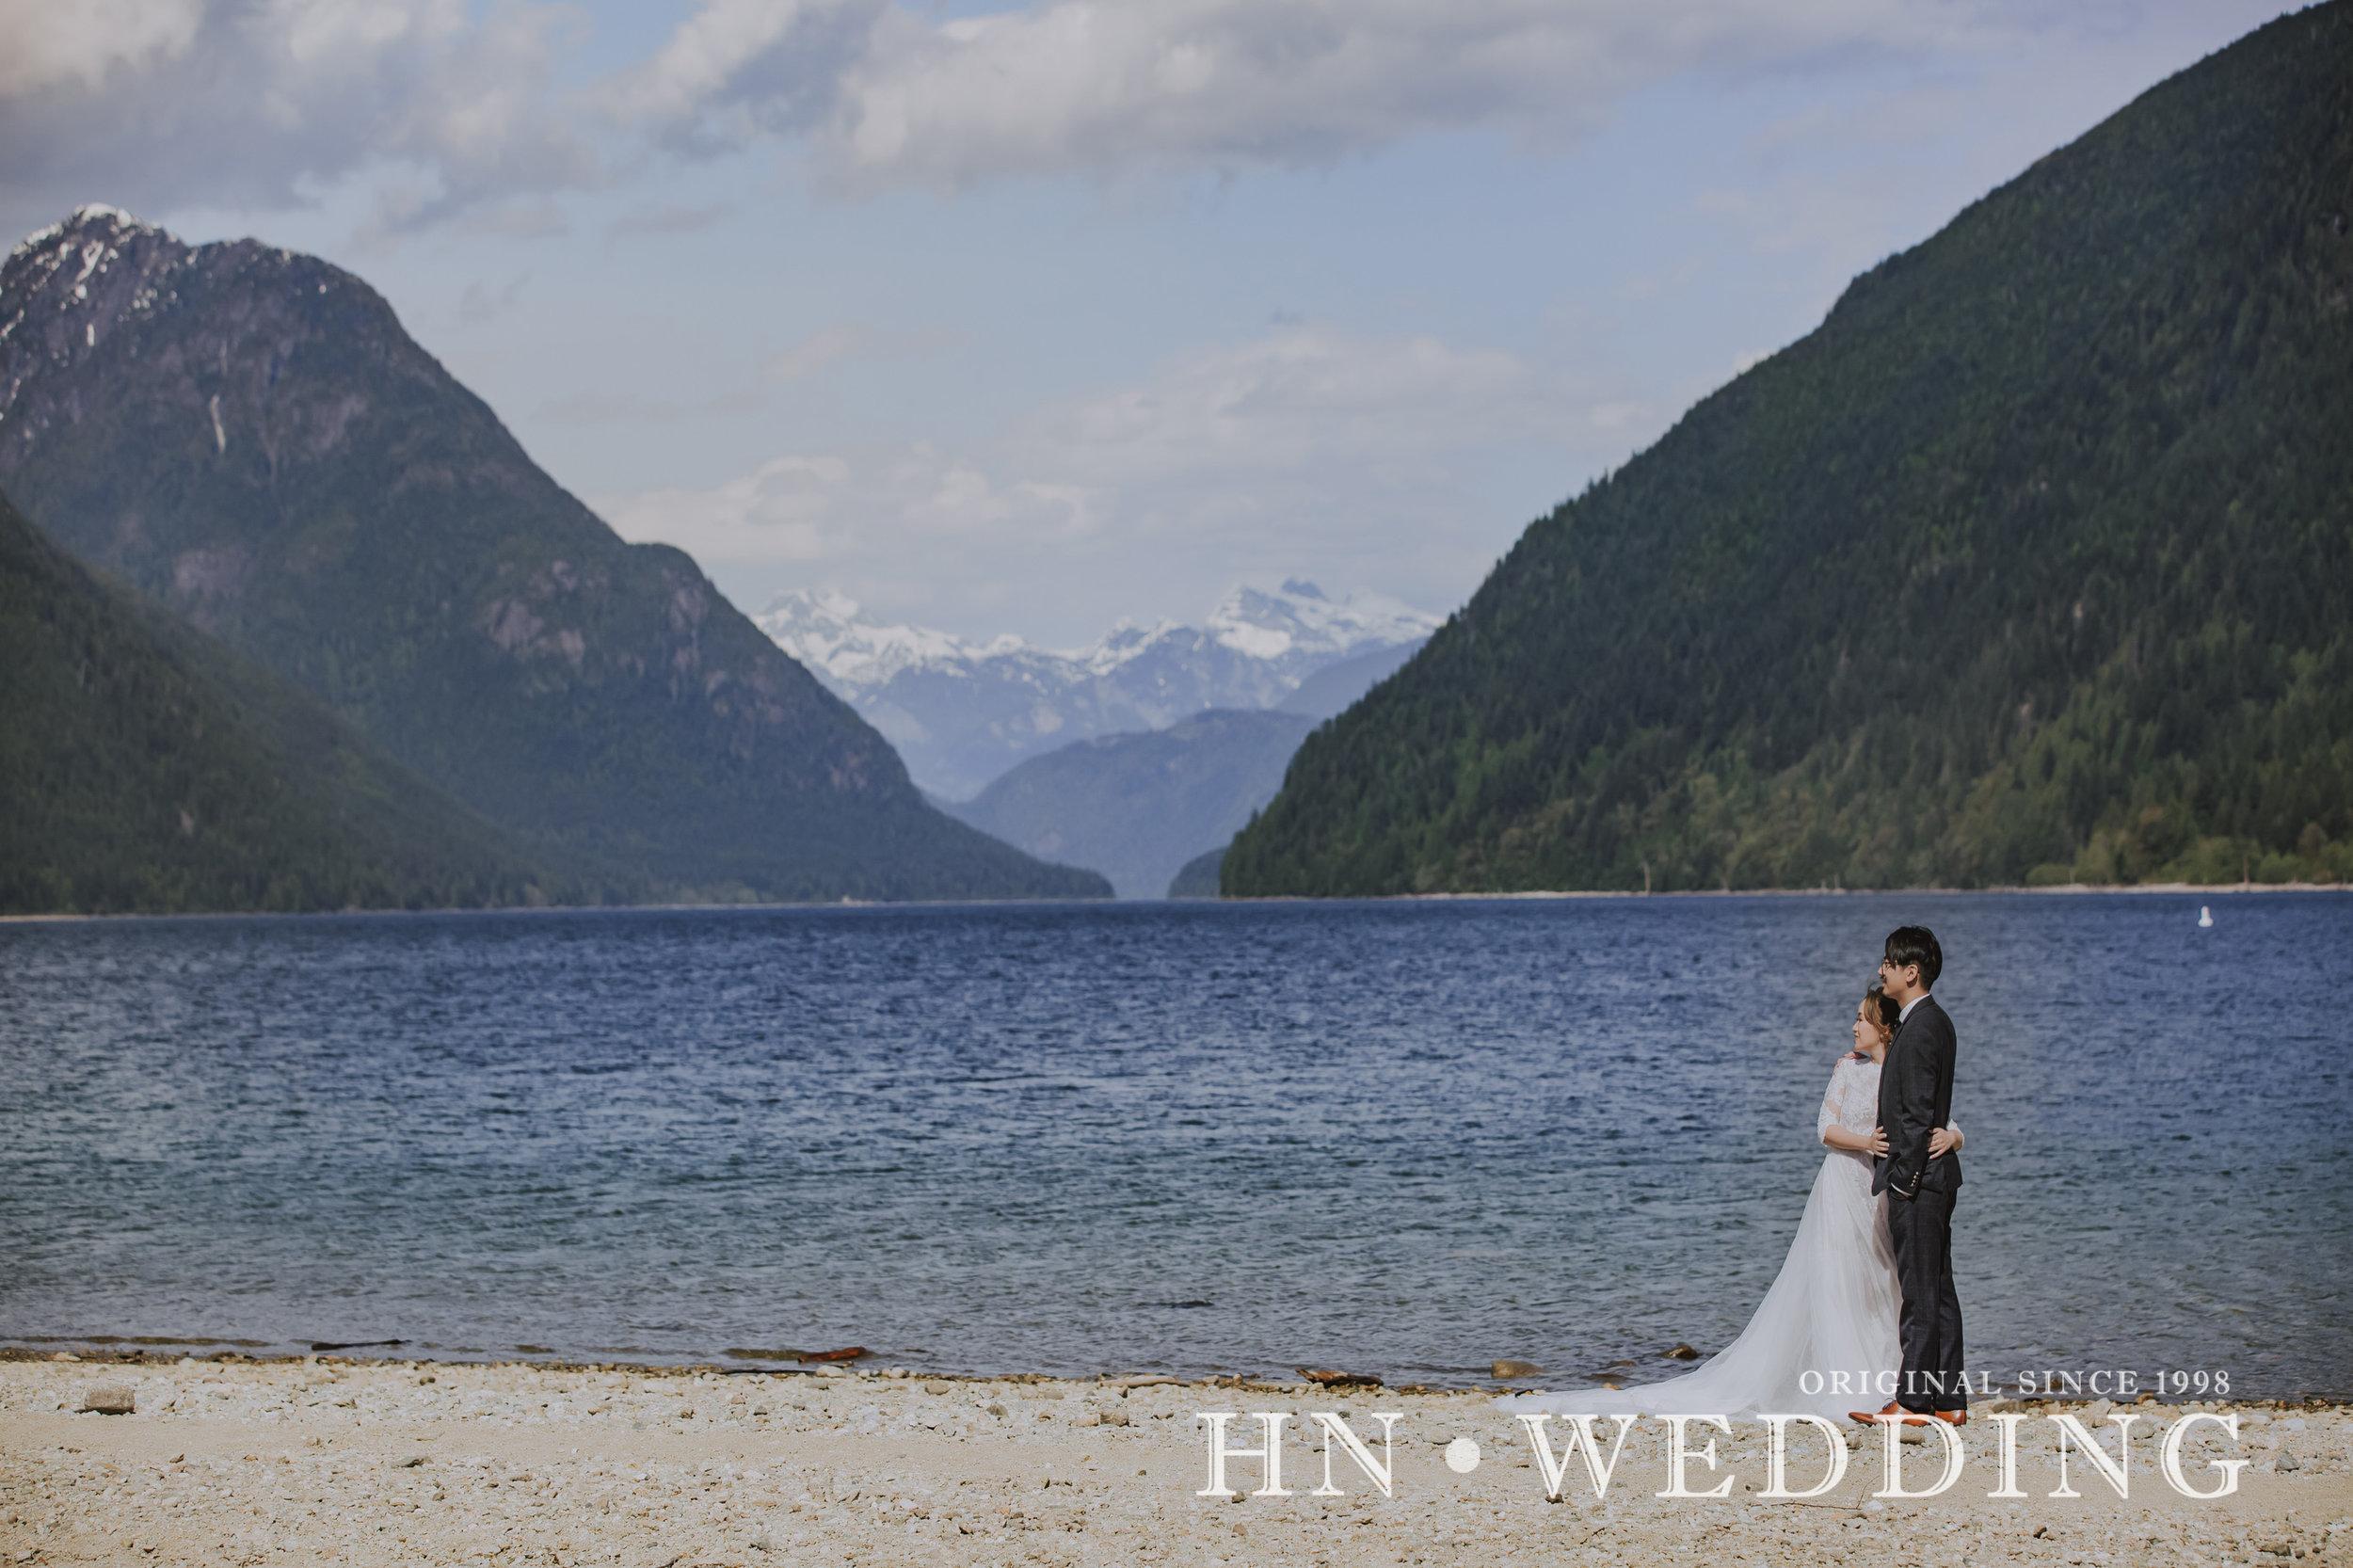 hnweddingweddingdayA&R-17.jpg